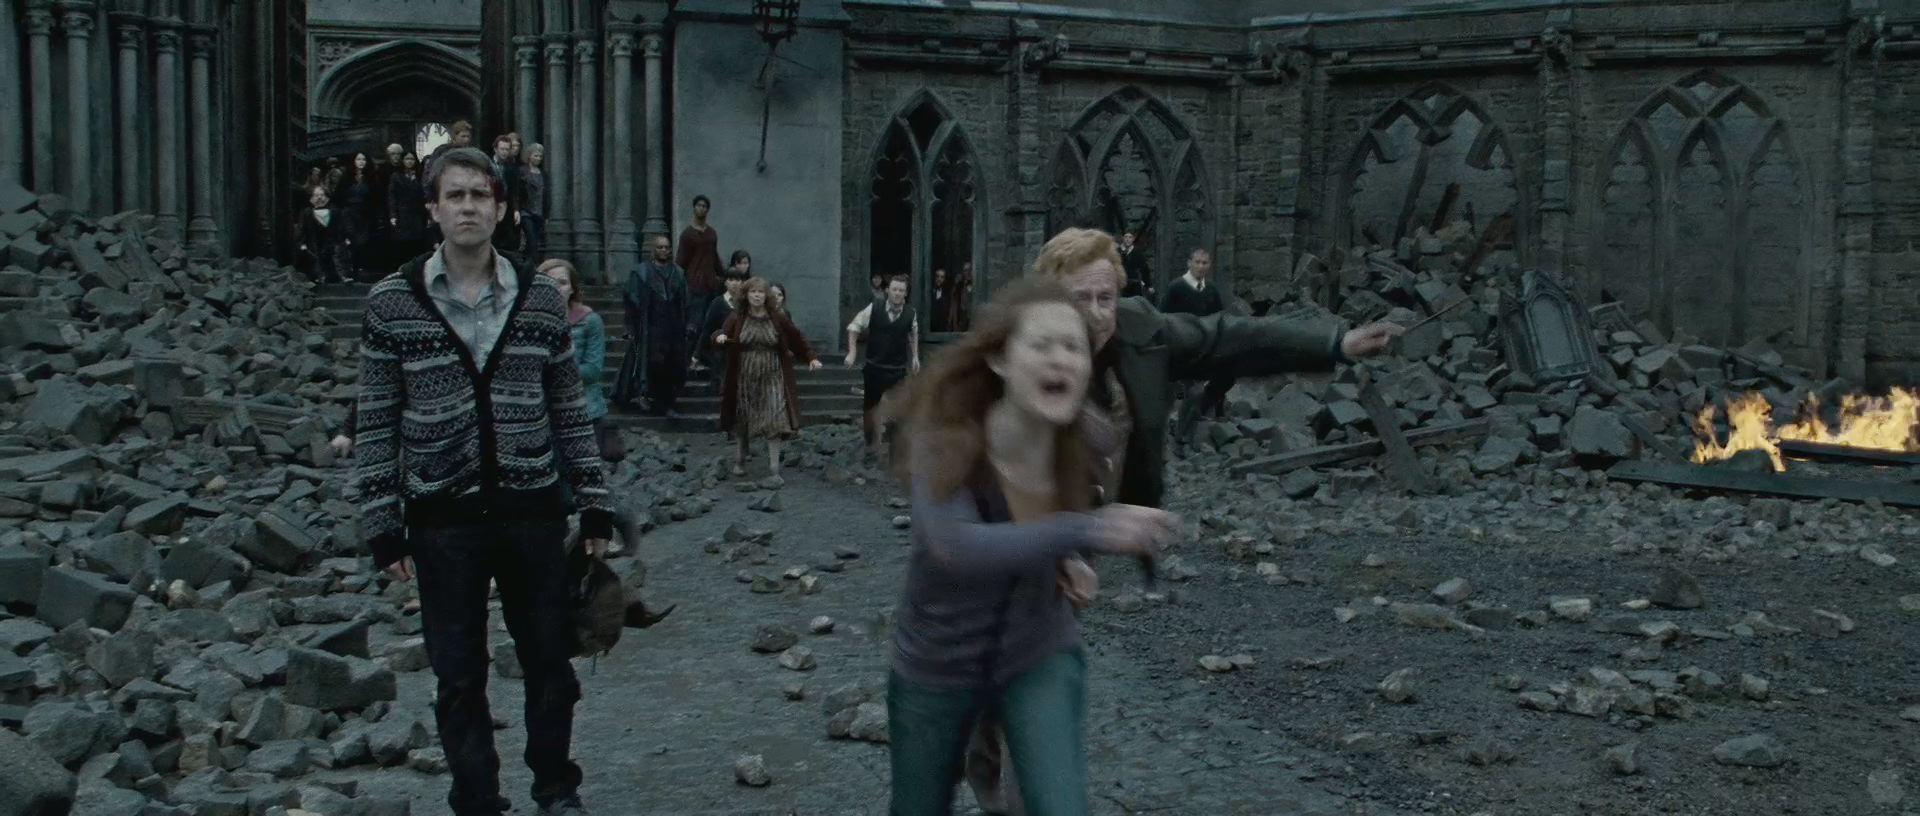 Harry Potter BlogHogwarts HP7 2 Trailer 91